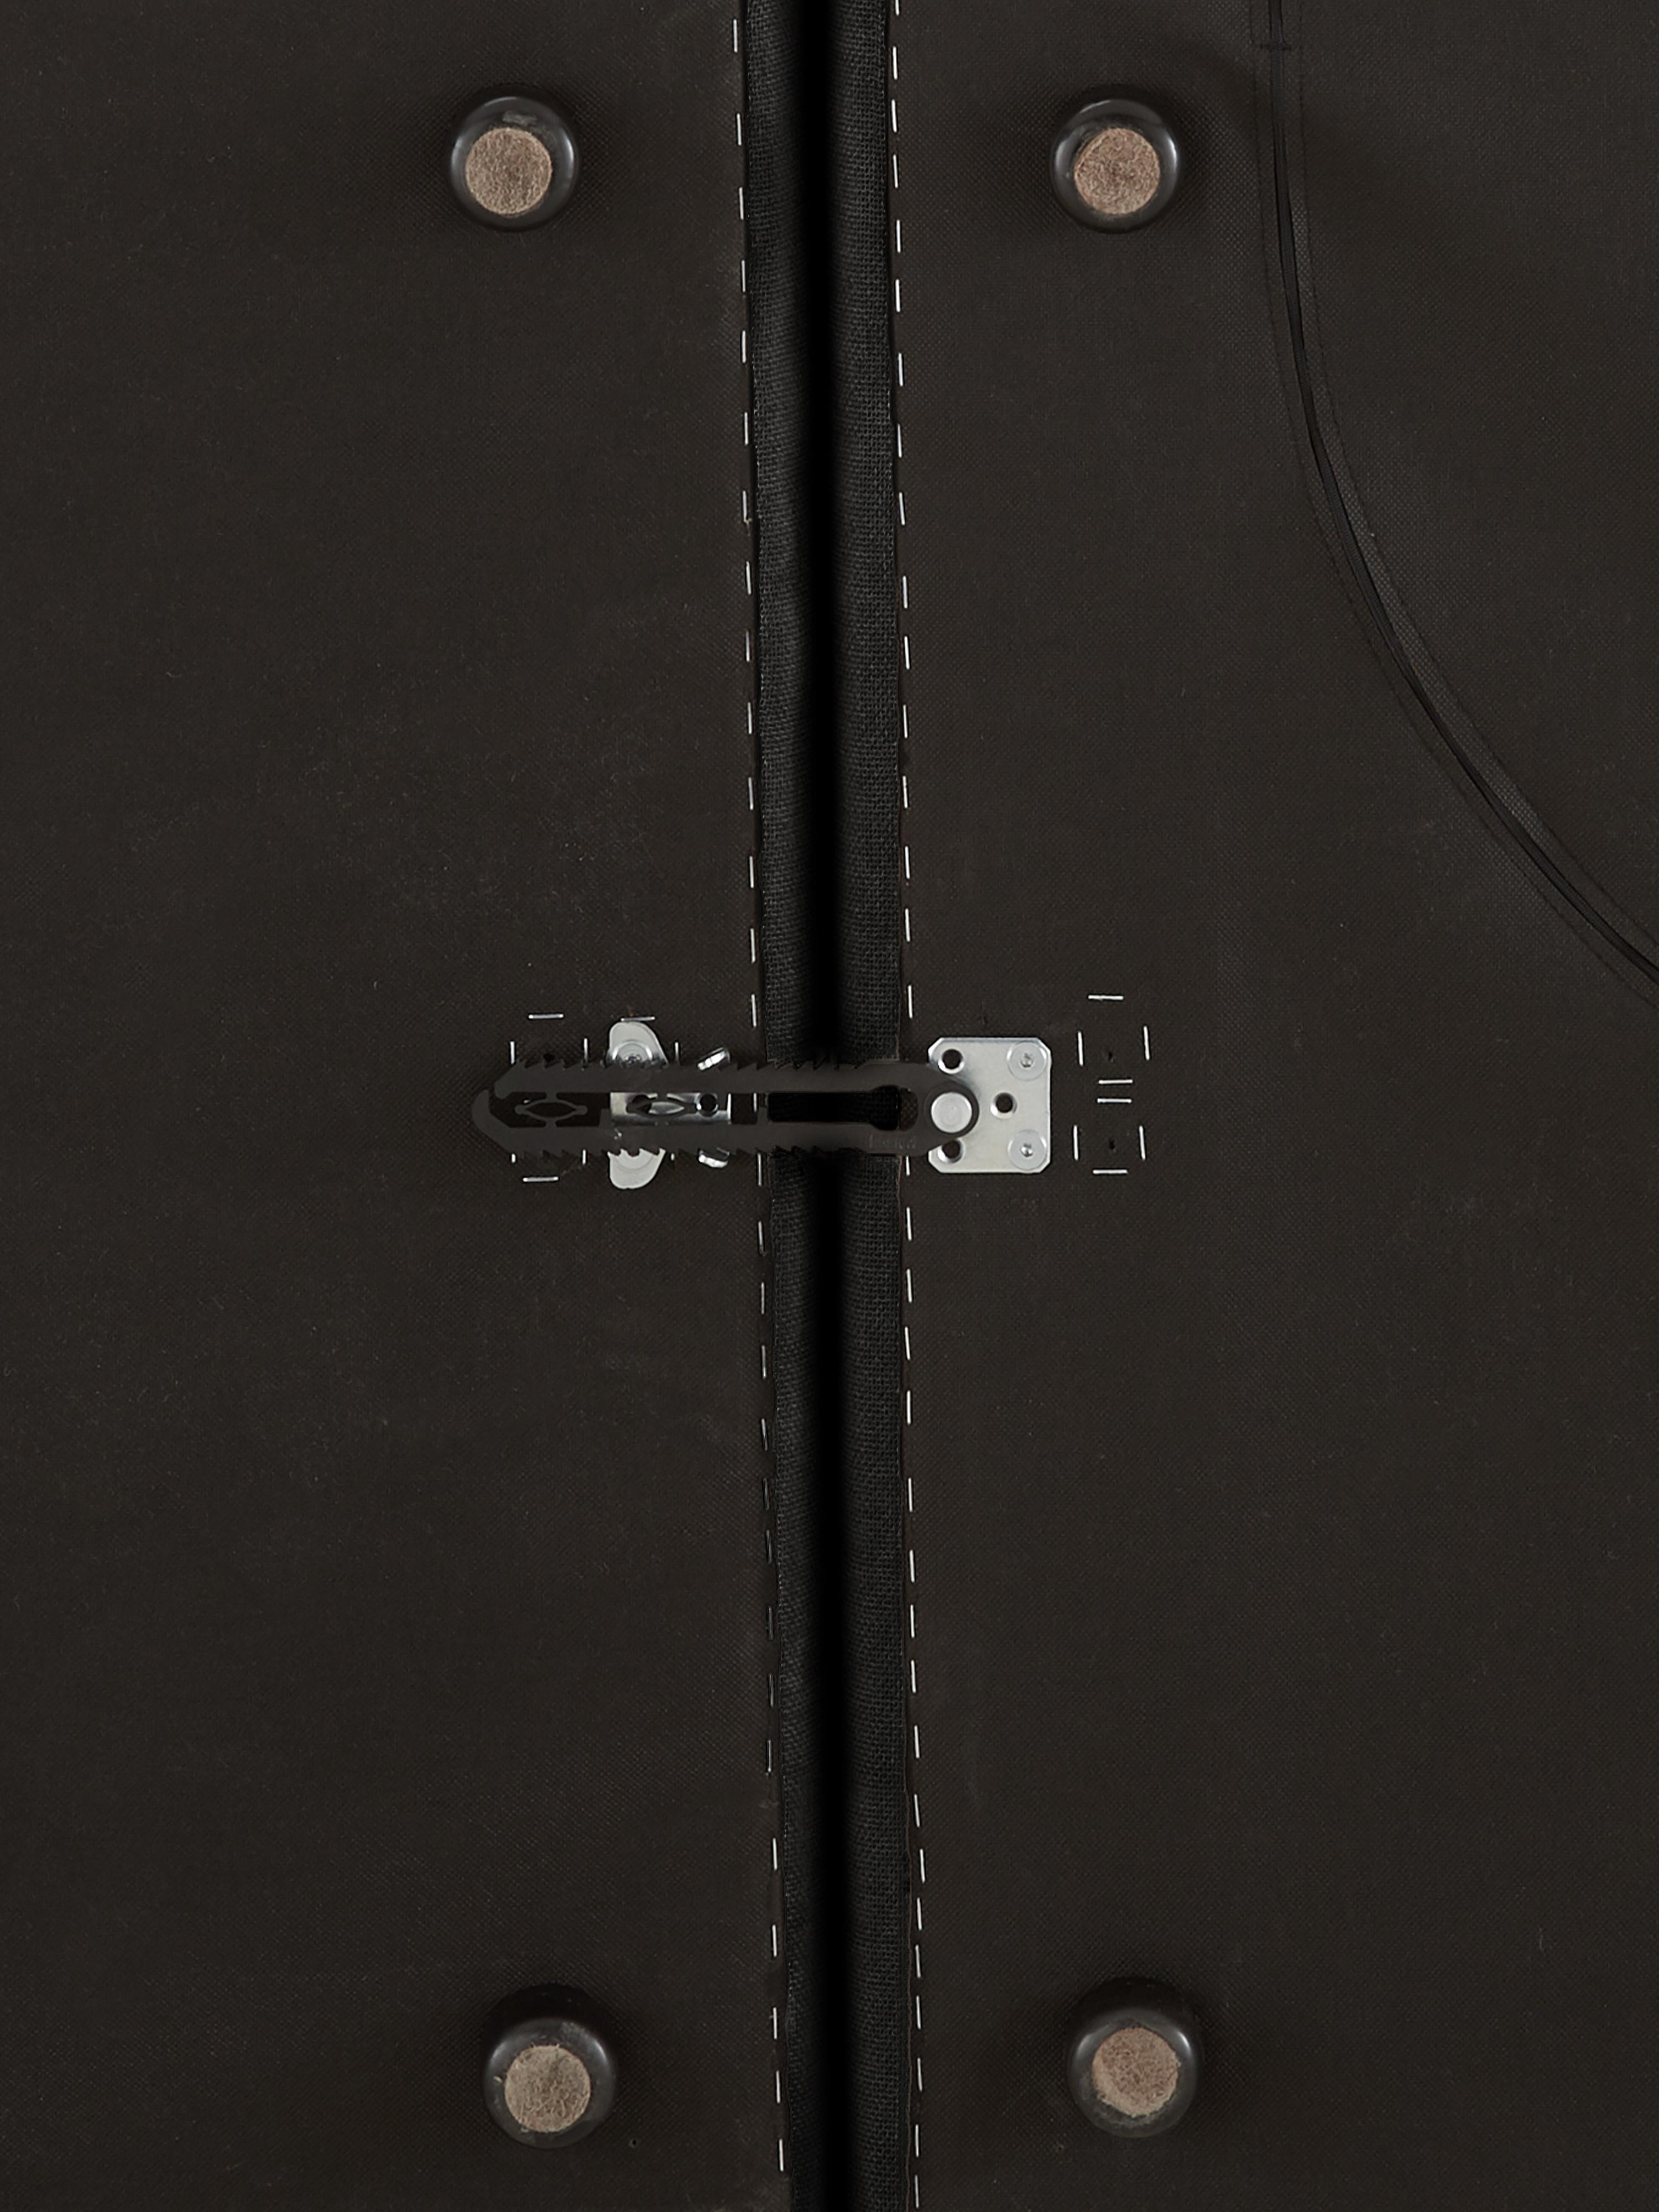 Modulare XL-Ottomane Lennon, Bezug: Polyester Der hochwertige, Gestell: Massives Kiefernholz, Spe, Füße: Kunststoff, Webstoff Anthrazit, B 357 x T 119 cm